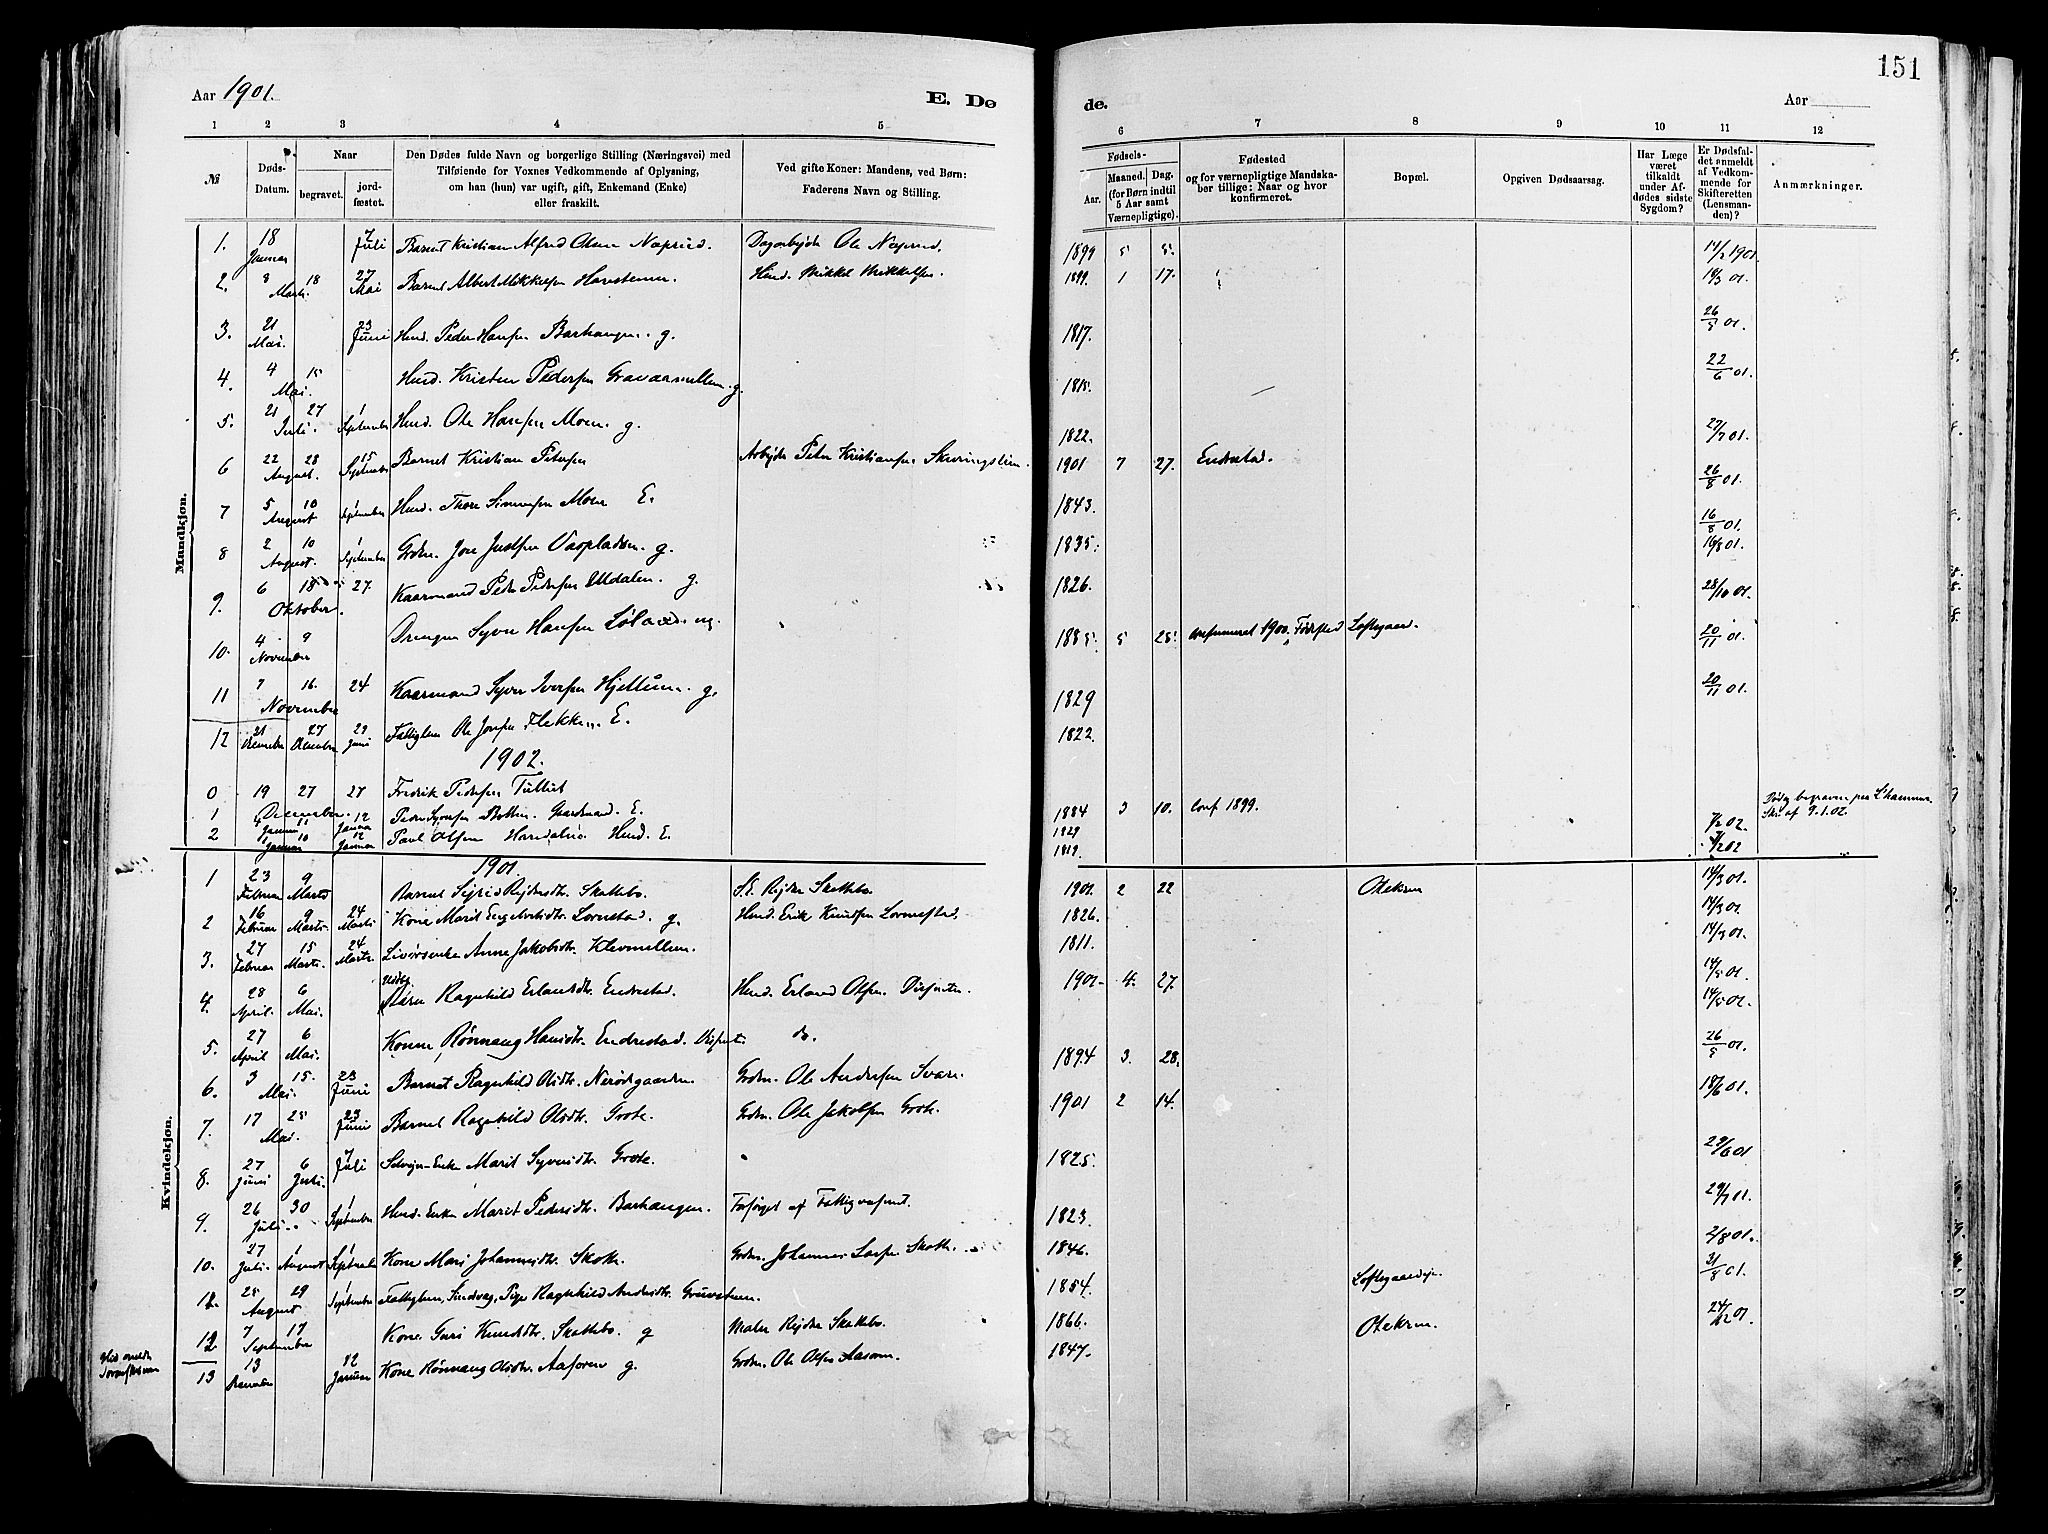 SAH, Vågå prestekontor, Ministerialbok nr. 8, 1886-1904, s. 151